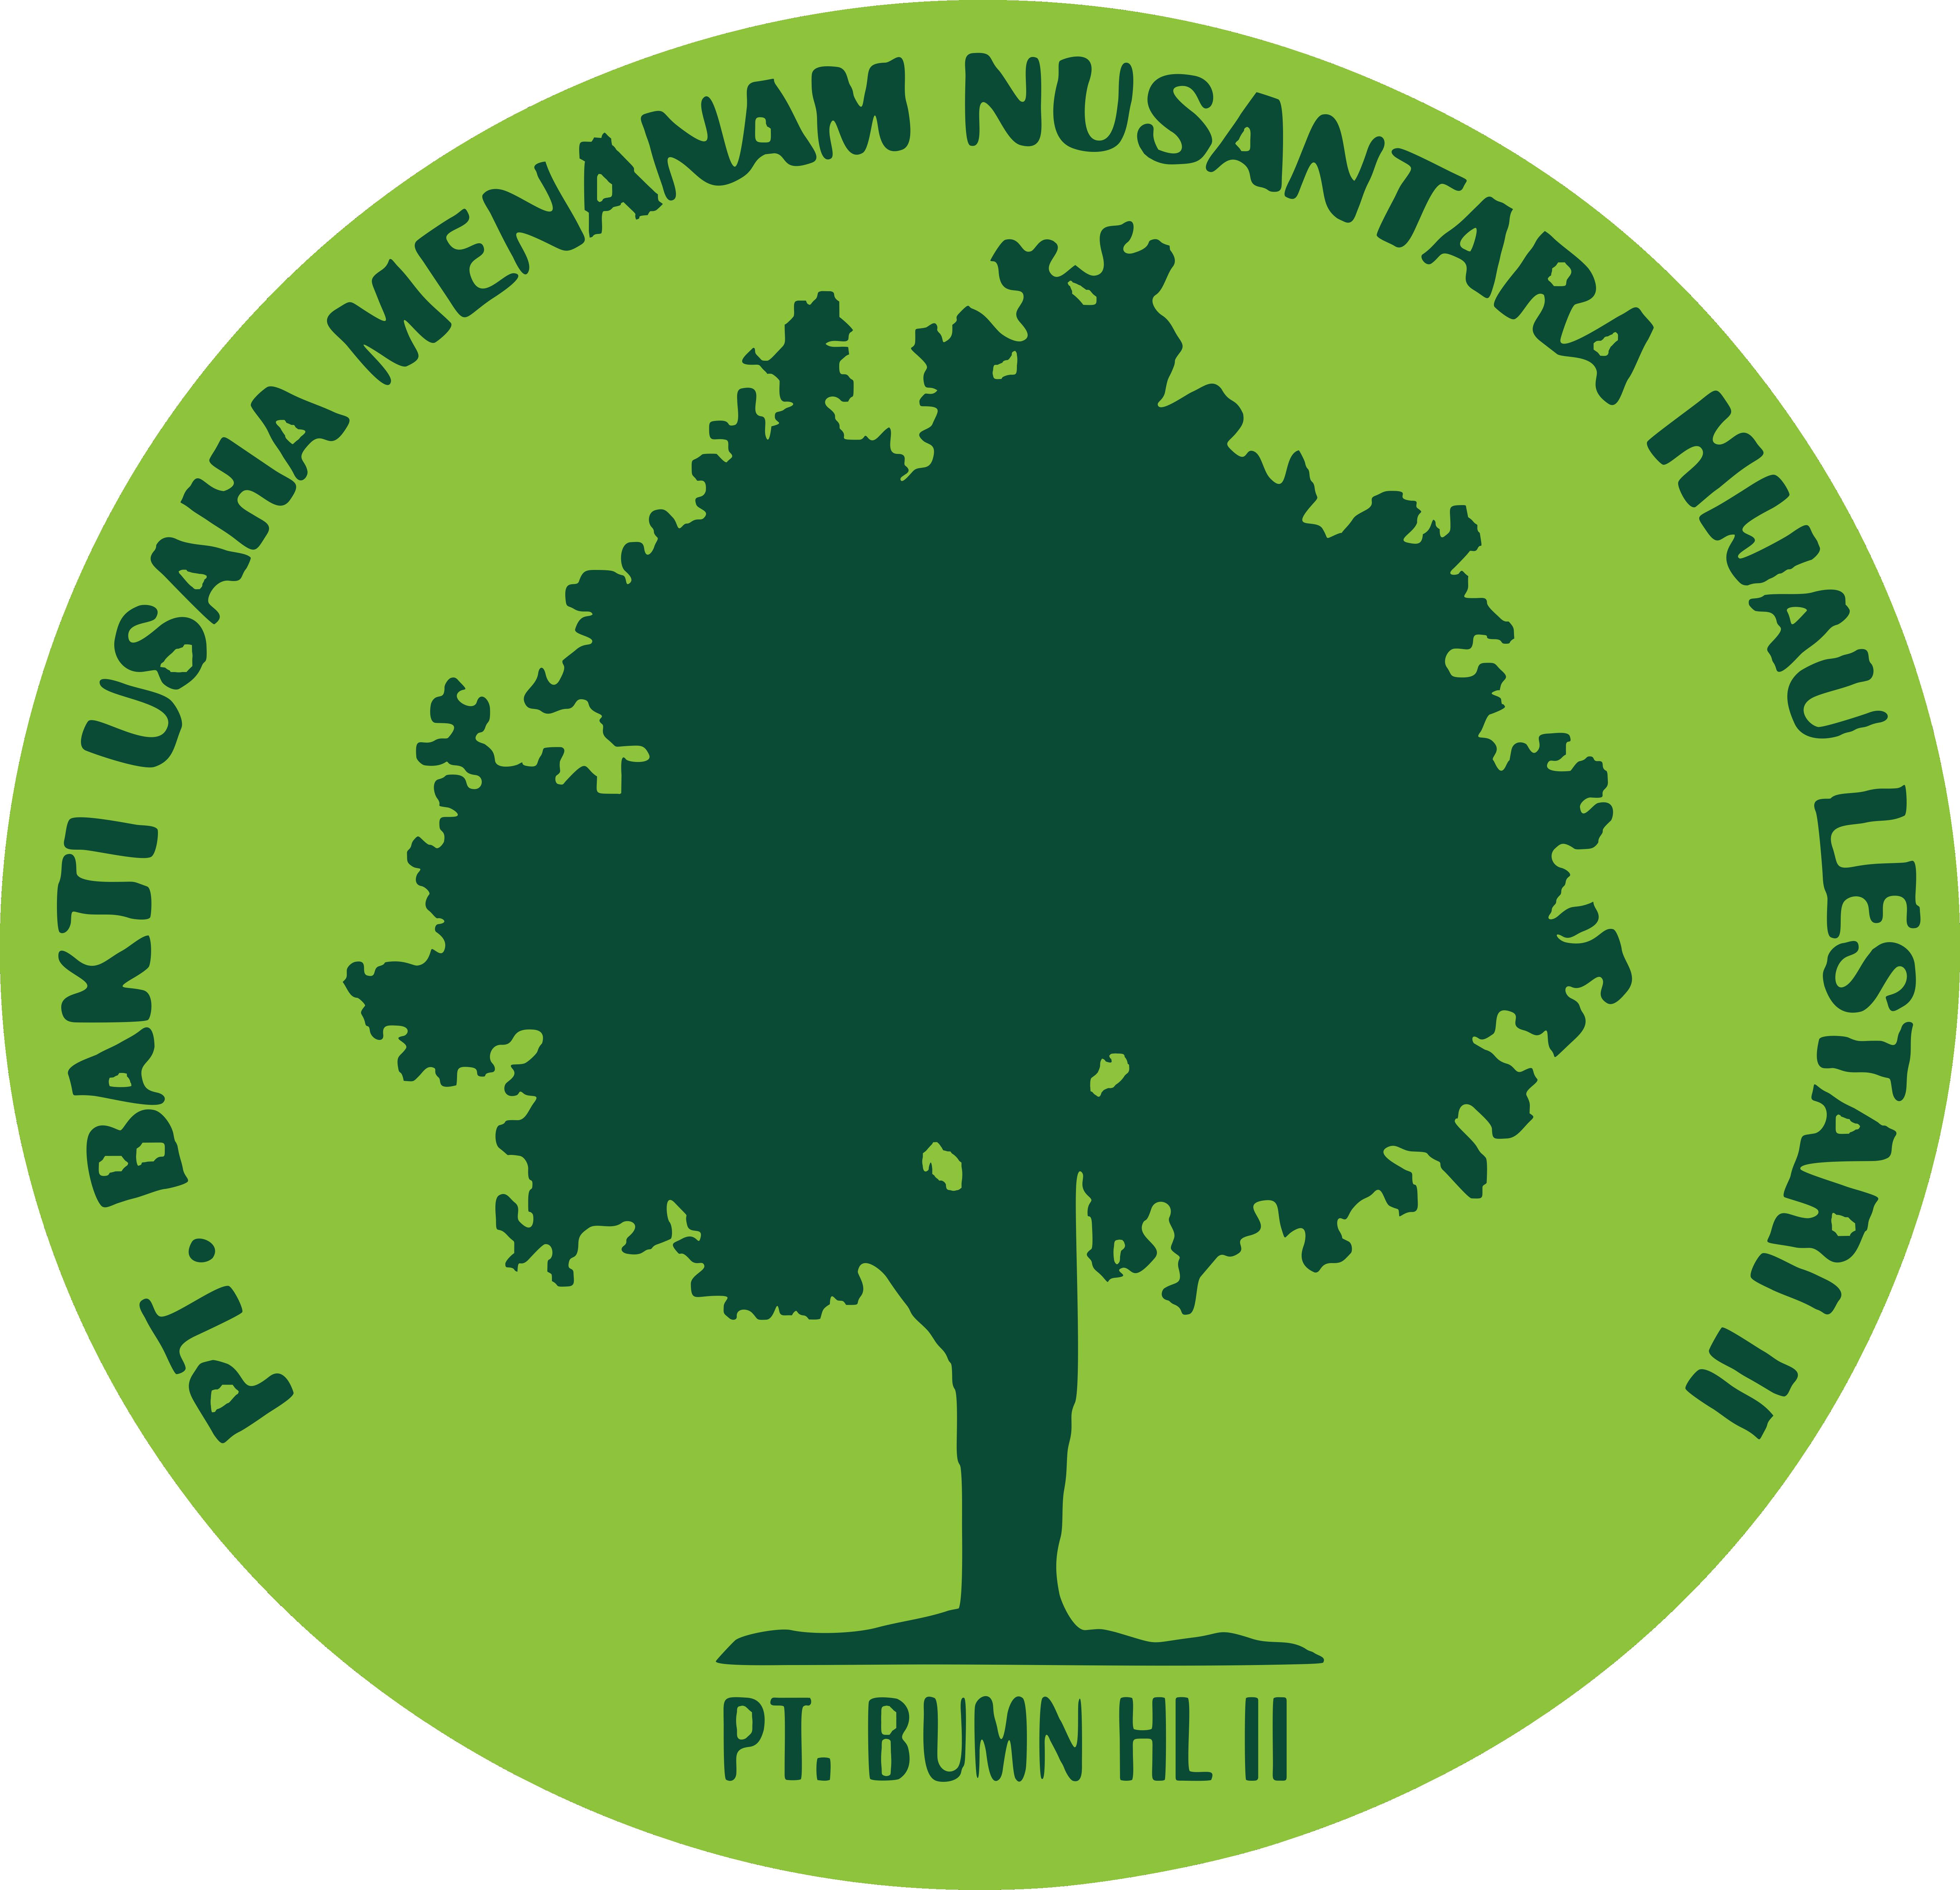 Bakti Usaha Menanam Nusantara Hijau Lestari II